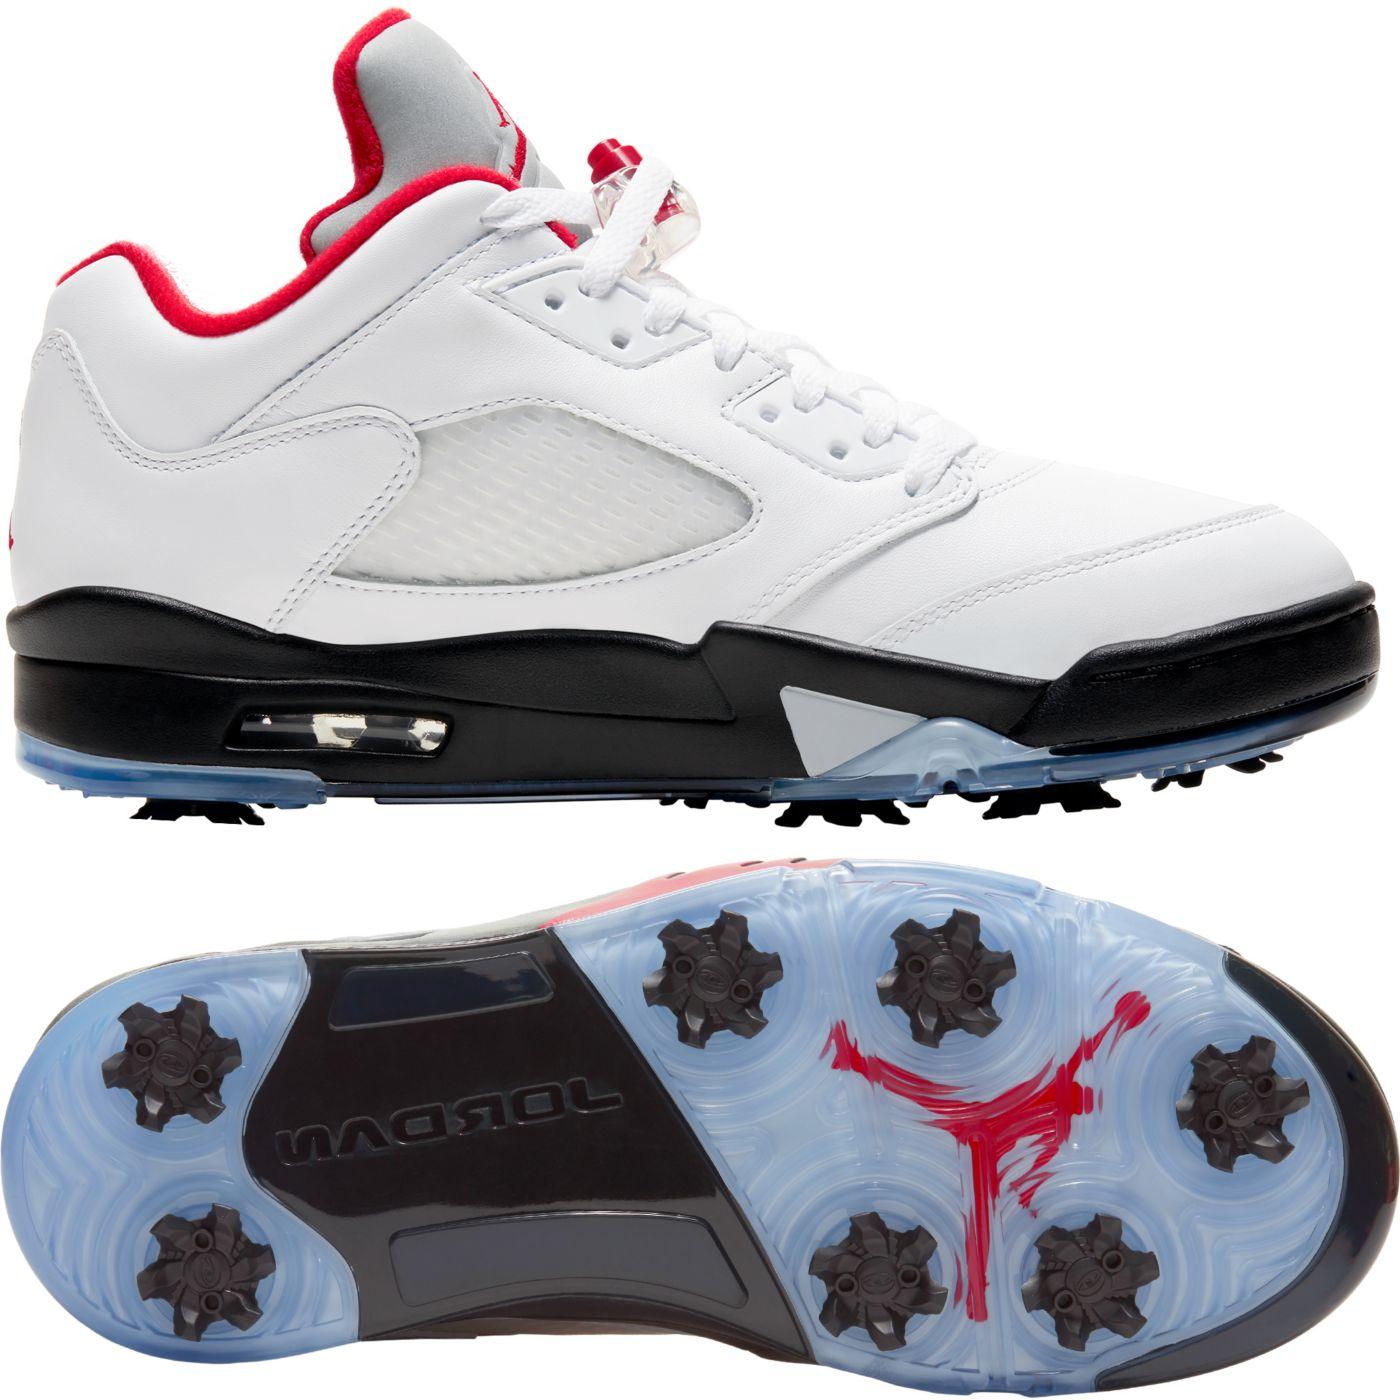 Nike Jordan 5 Low G Golf Shoes